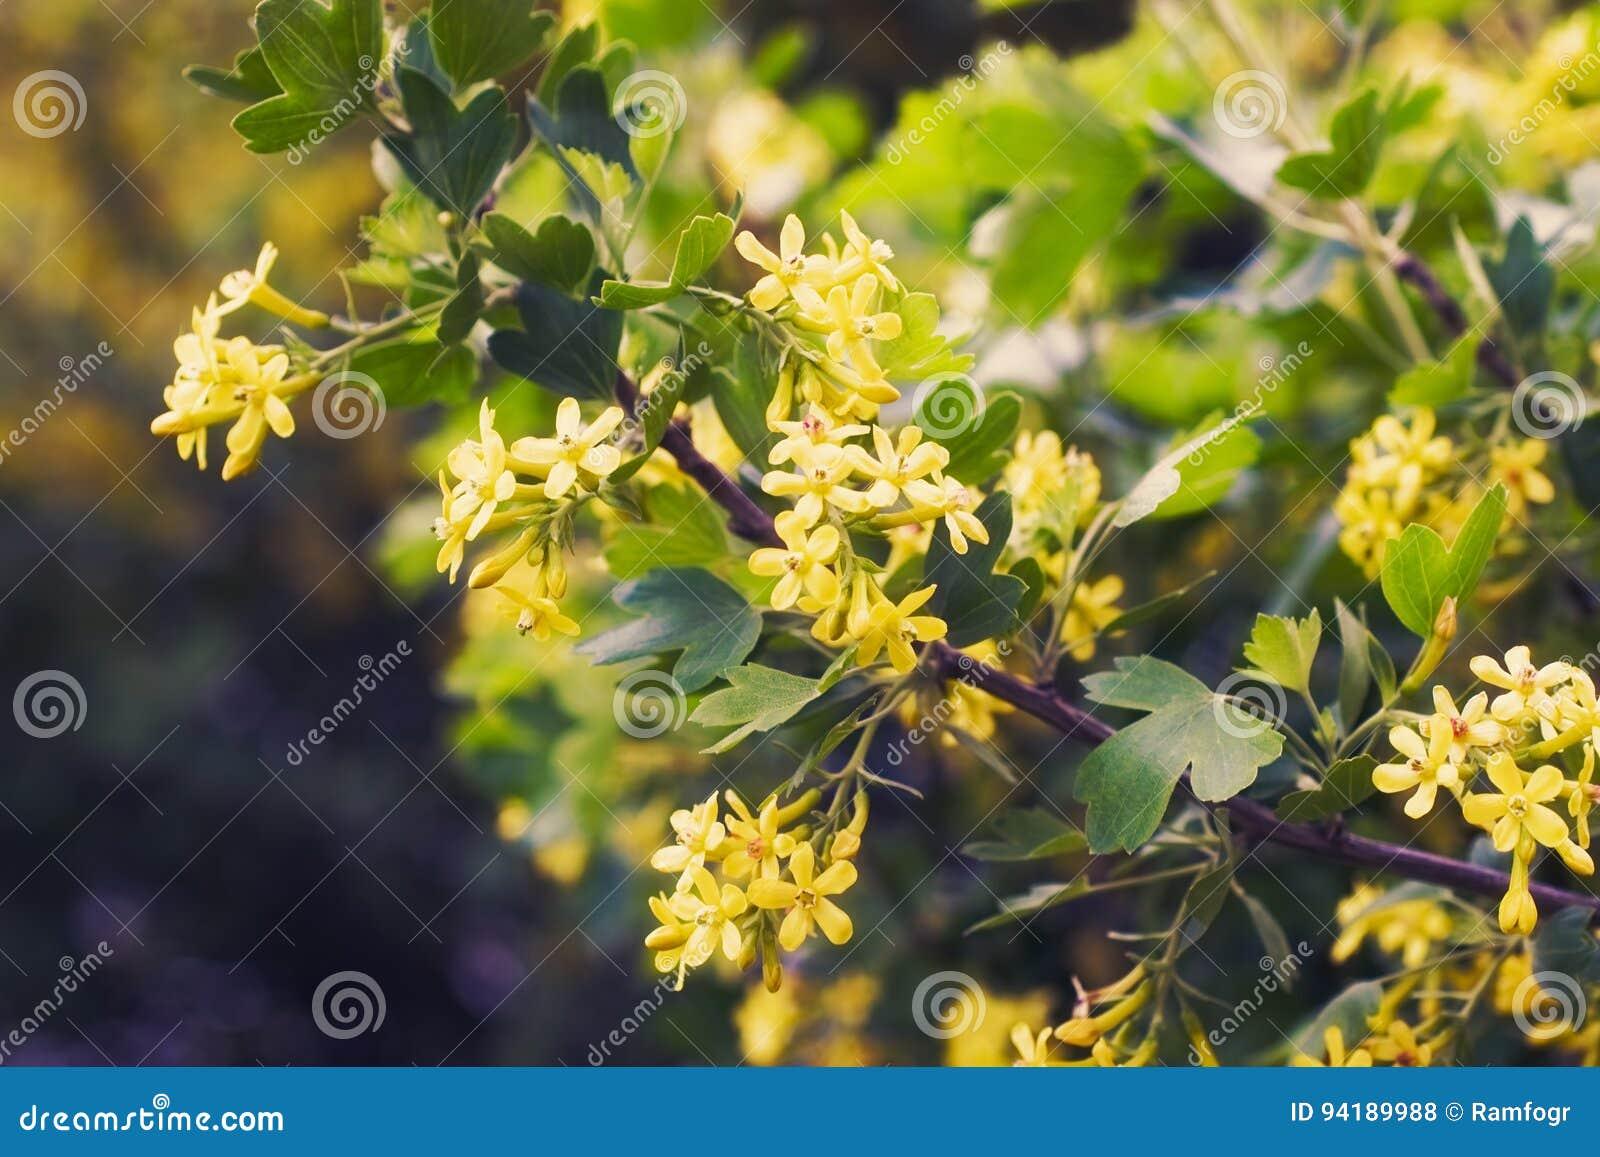 Golden Buffalo Currant Ribes Aureum Stock Photo Image Of Bright